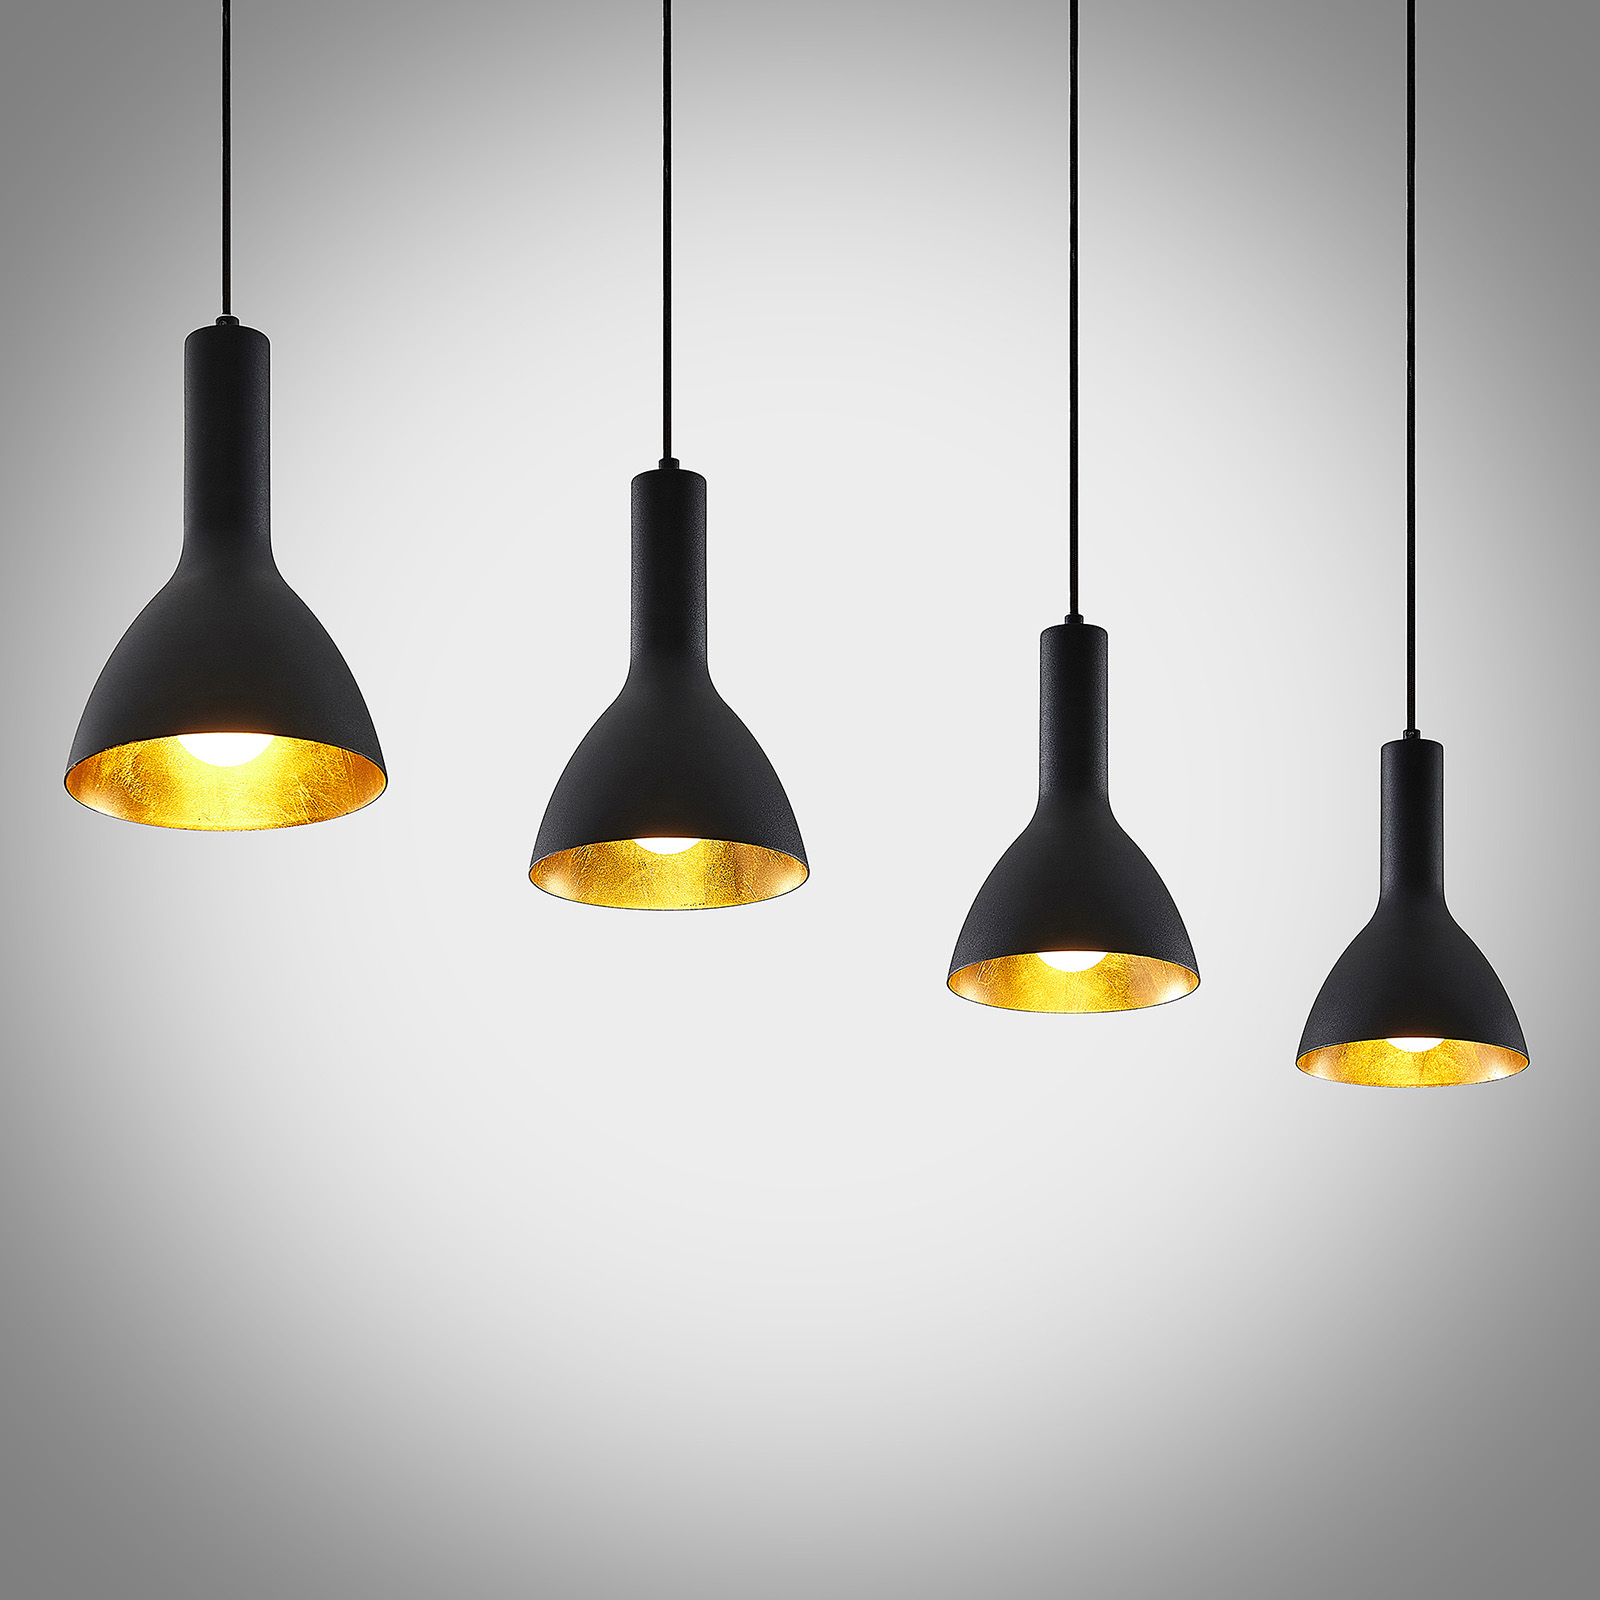 Arcchio Cosmina hänglampa, 4 lampa lång svart